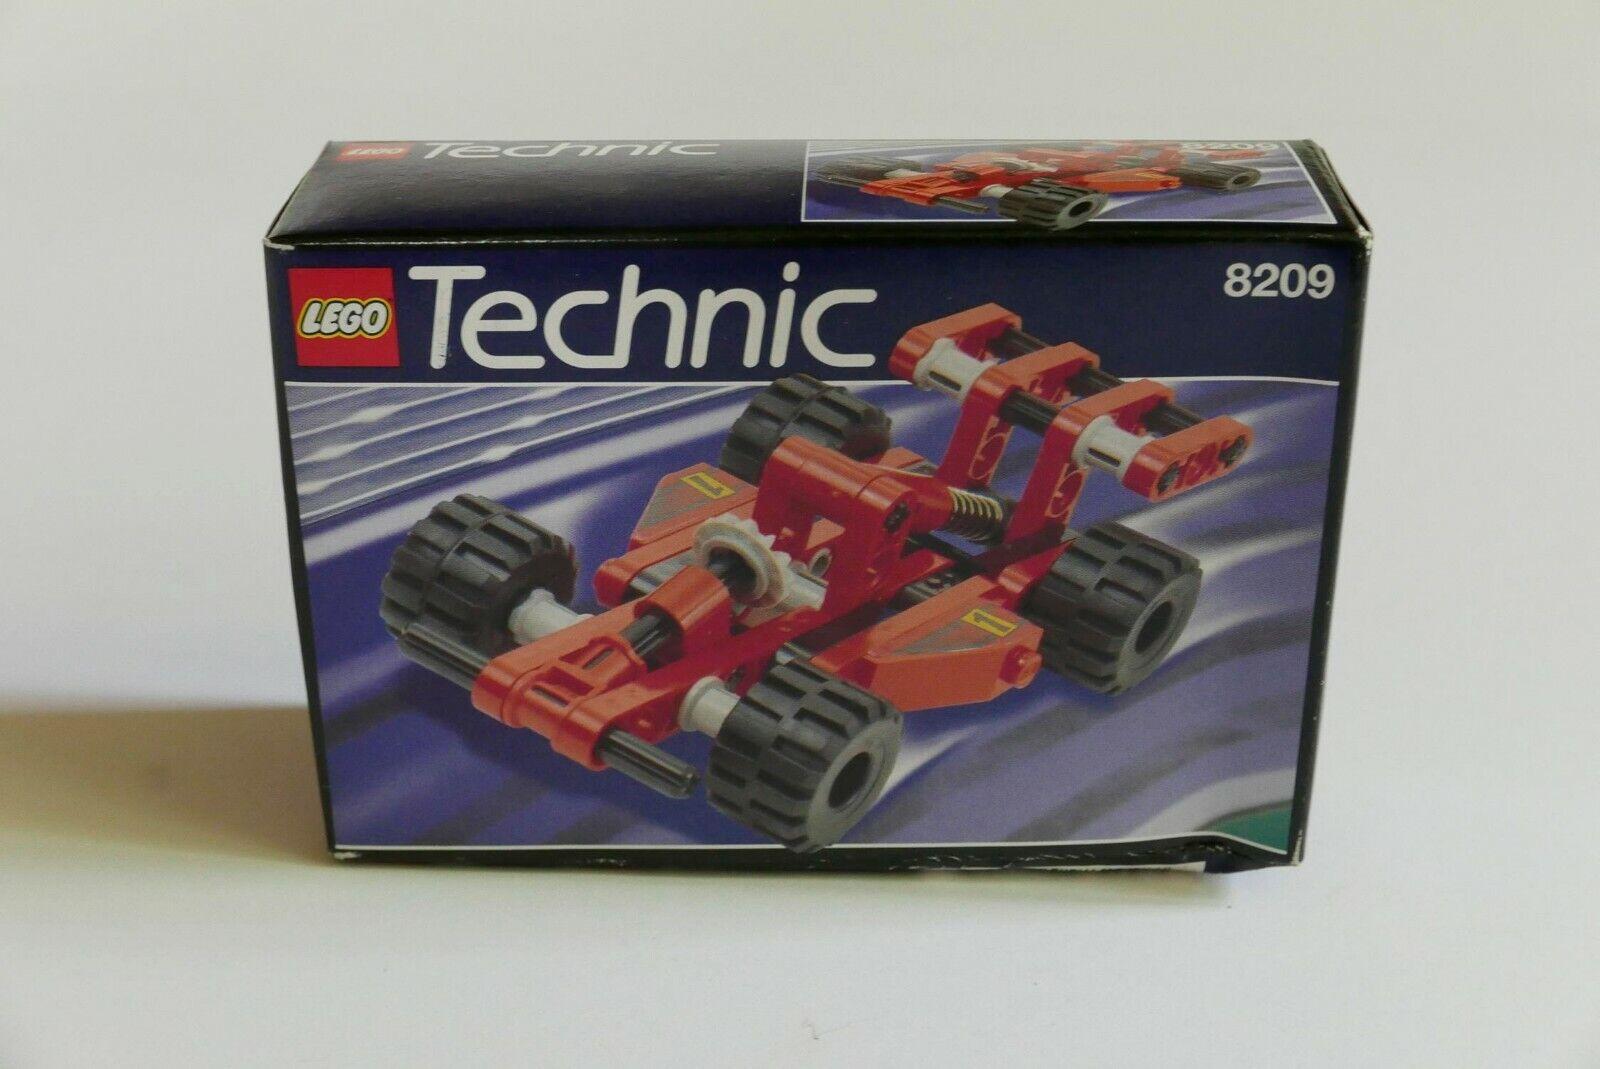 LEGO Technic 8209 Future F1 NEW Sealed RARE Vintage